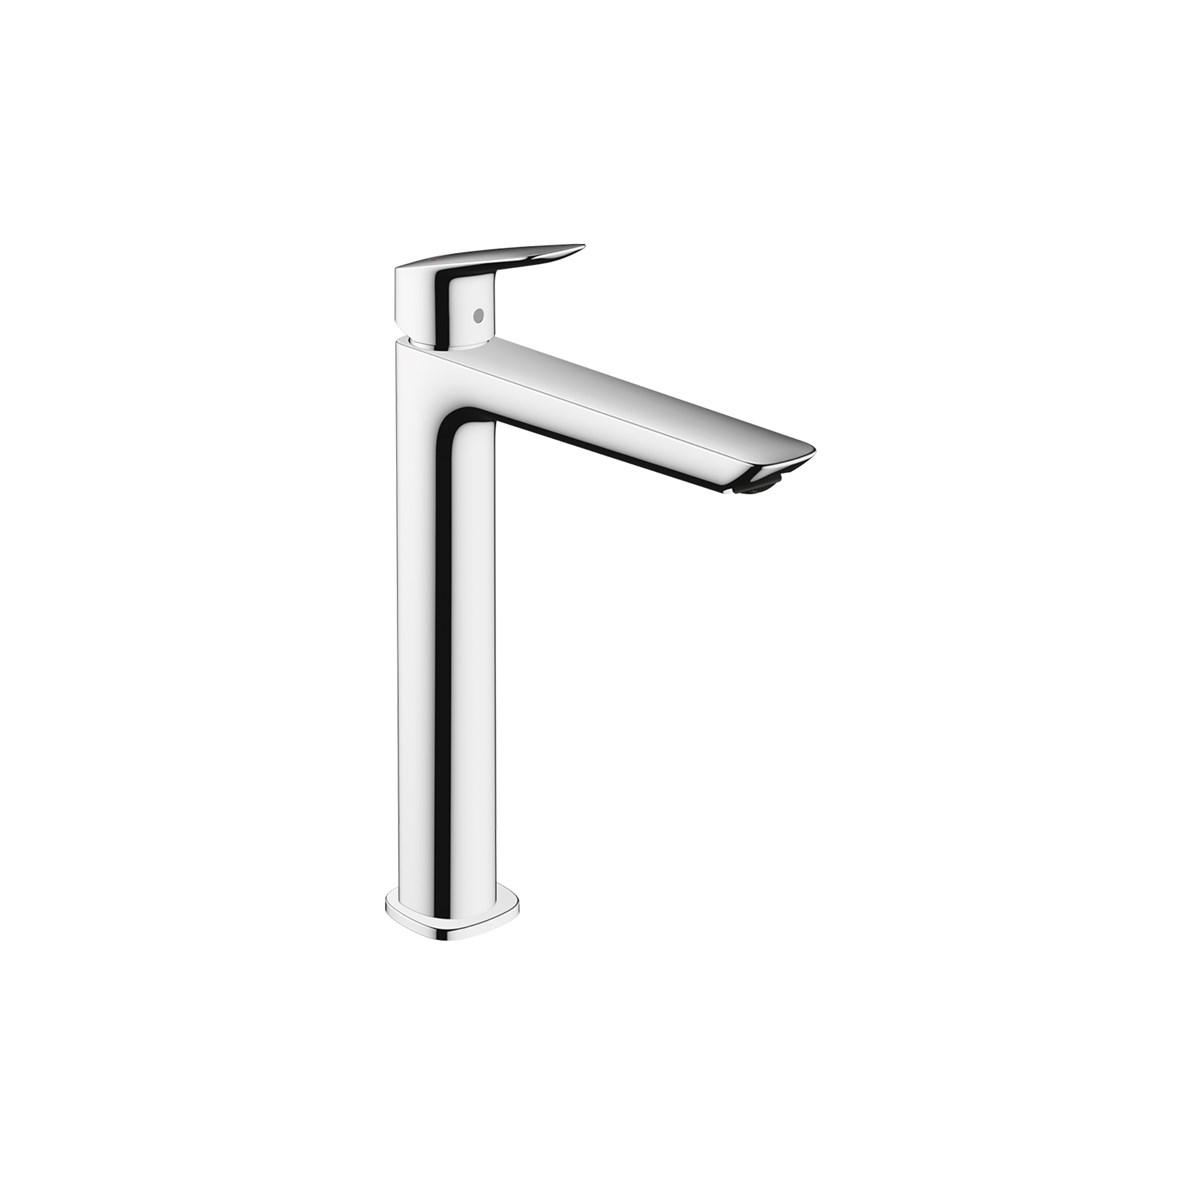 Hansgrohe-Logis-Fine-Basin-Fixer-240-71258000-Matisse-1